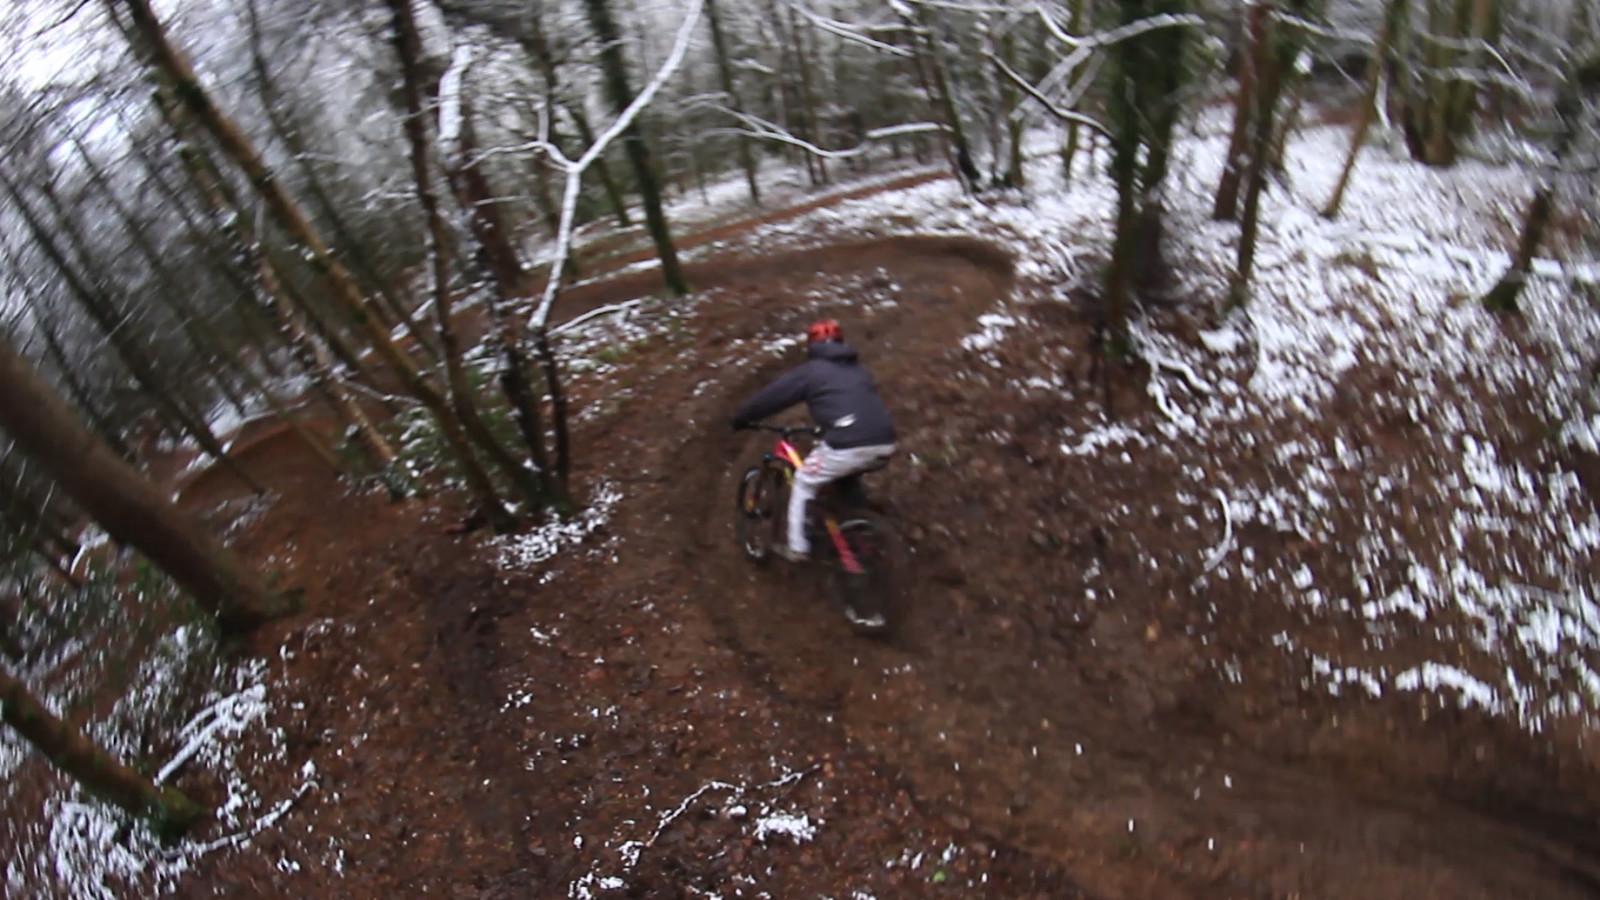 JACK TOM Shr-Edit - Matthew Davies - Mountain Biking Pictures - Vital MTB